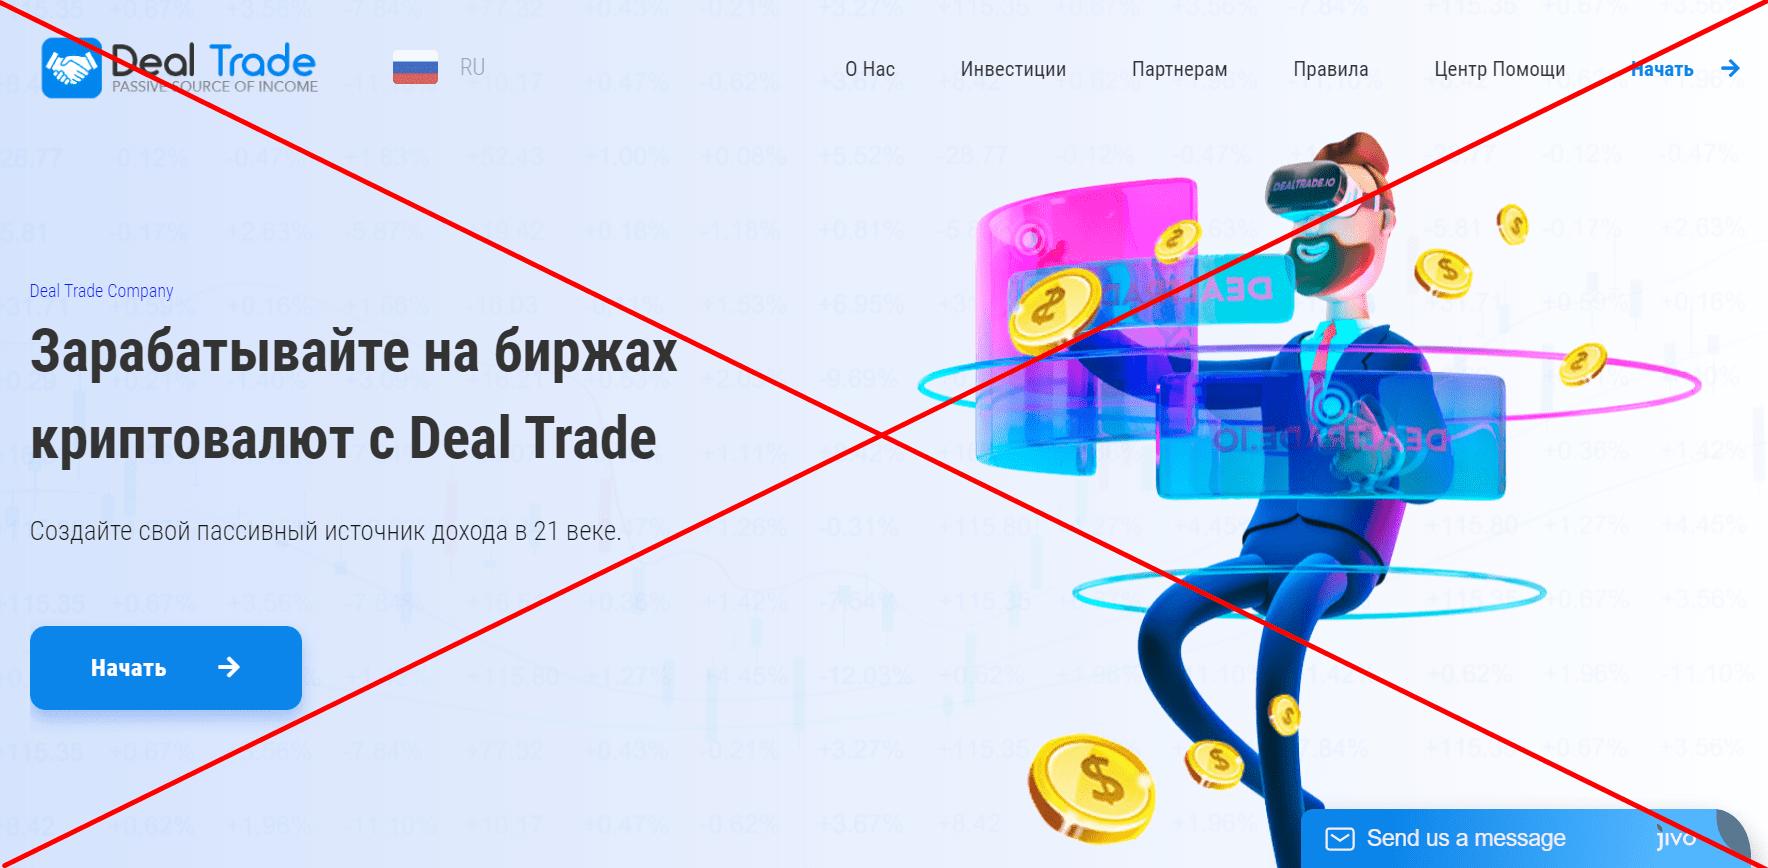 Deal Trade - реальные отзывы